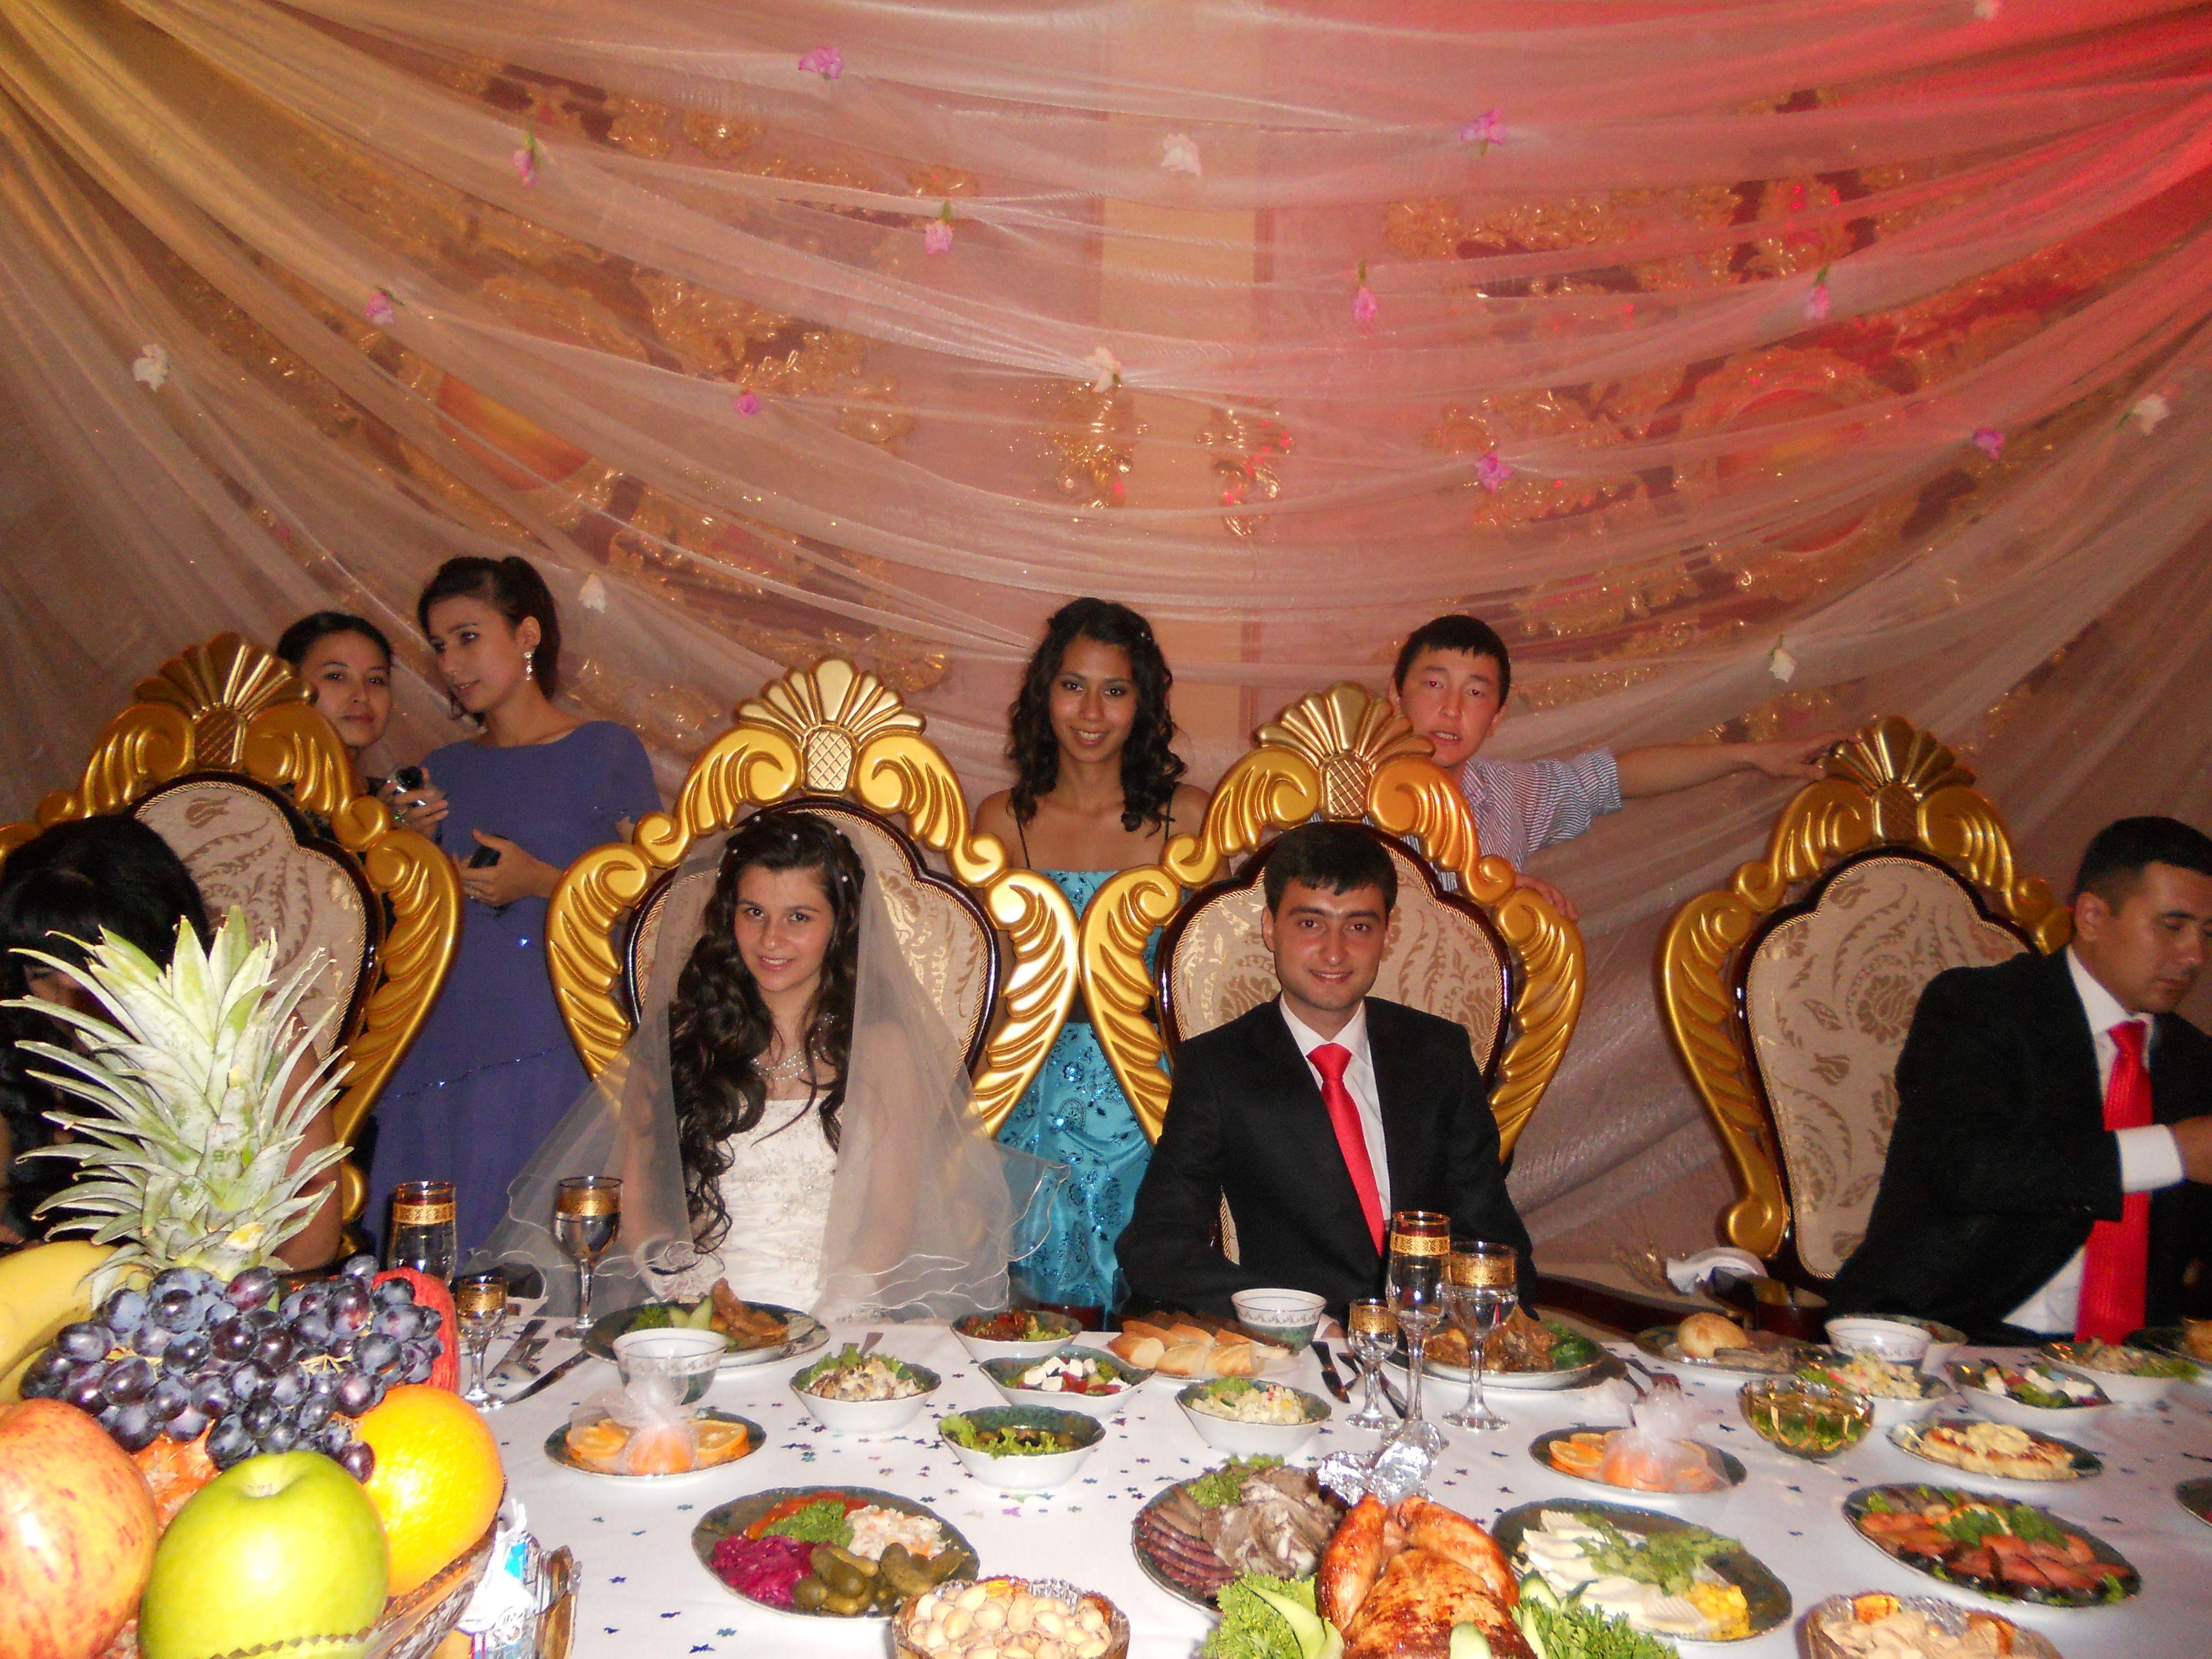 Uzbek wedding, what it really is